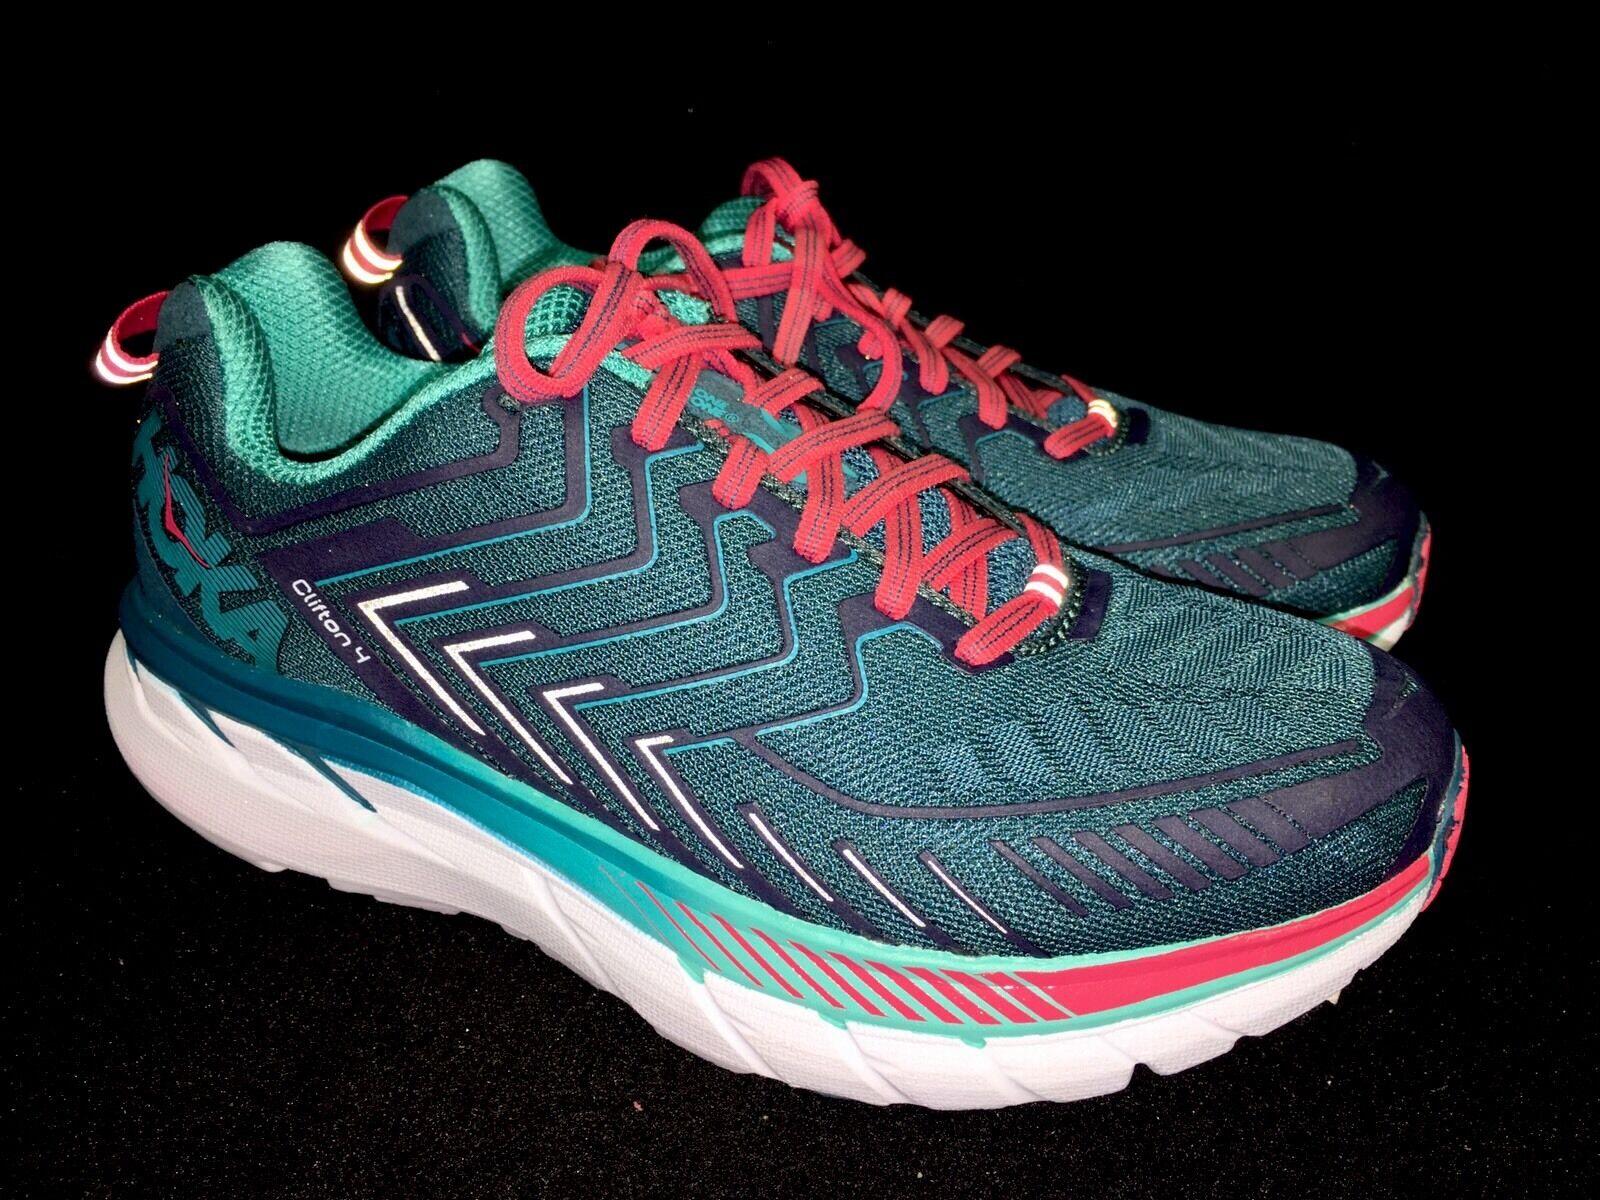 Hoka One One Clifton 4 blu Coral Ceramic Running Tennis scarpe 1016724 Dimensiones